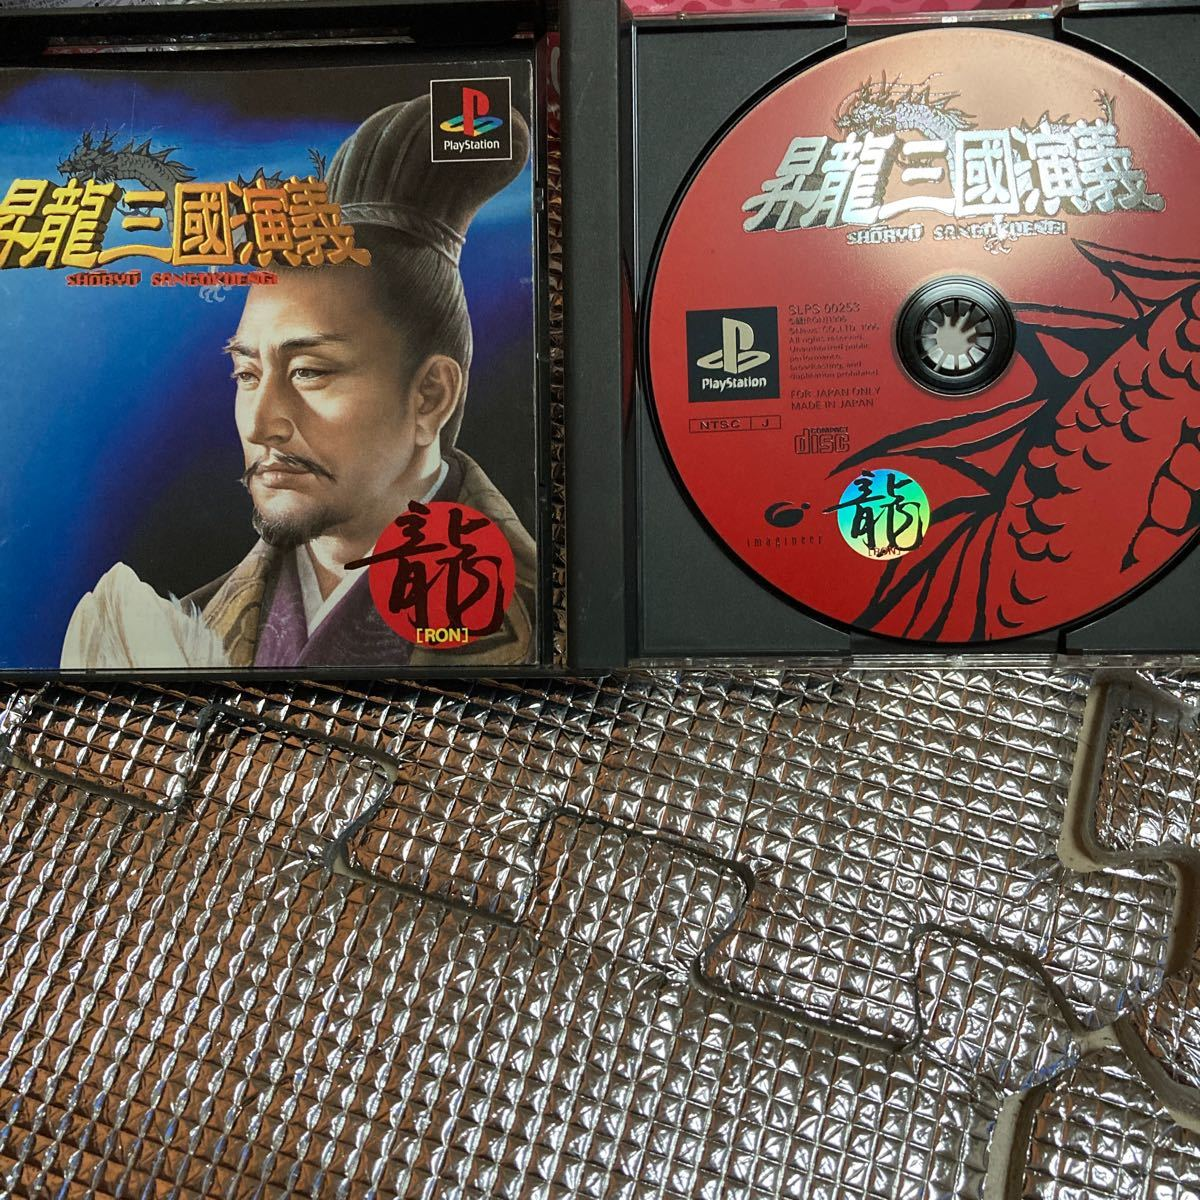 ps2.ソフト、昇龍三国演義